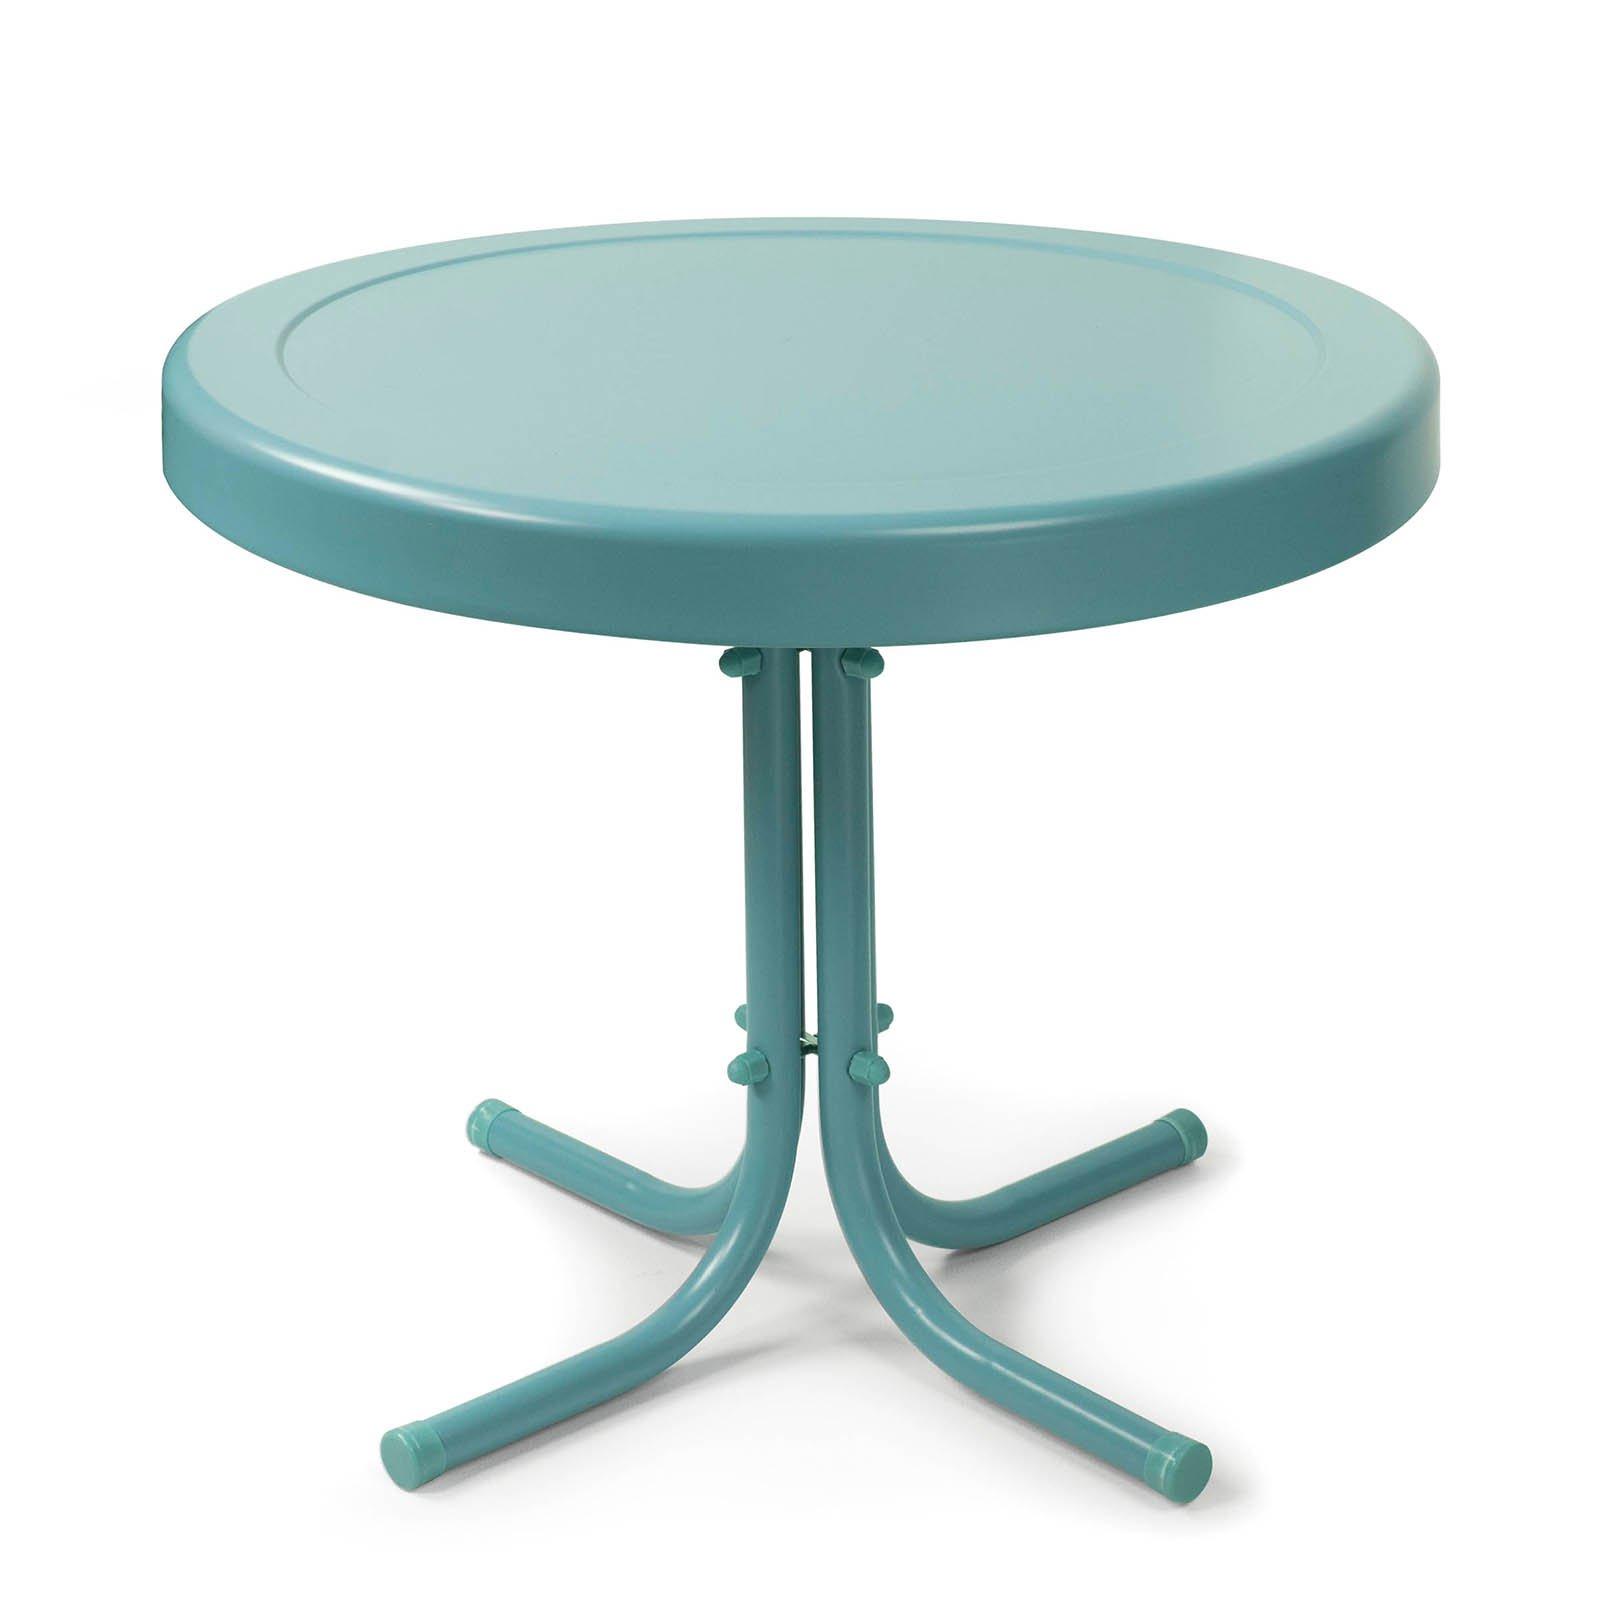 Merveilleux Metal Round Patio Tables